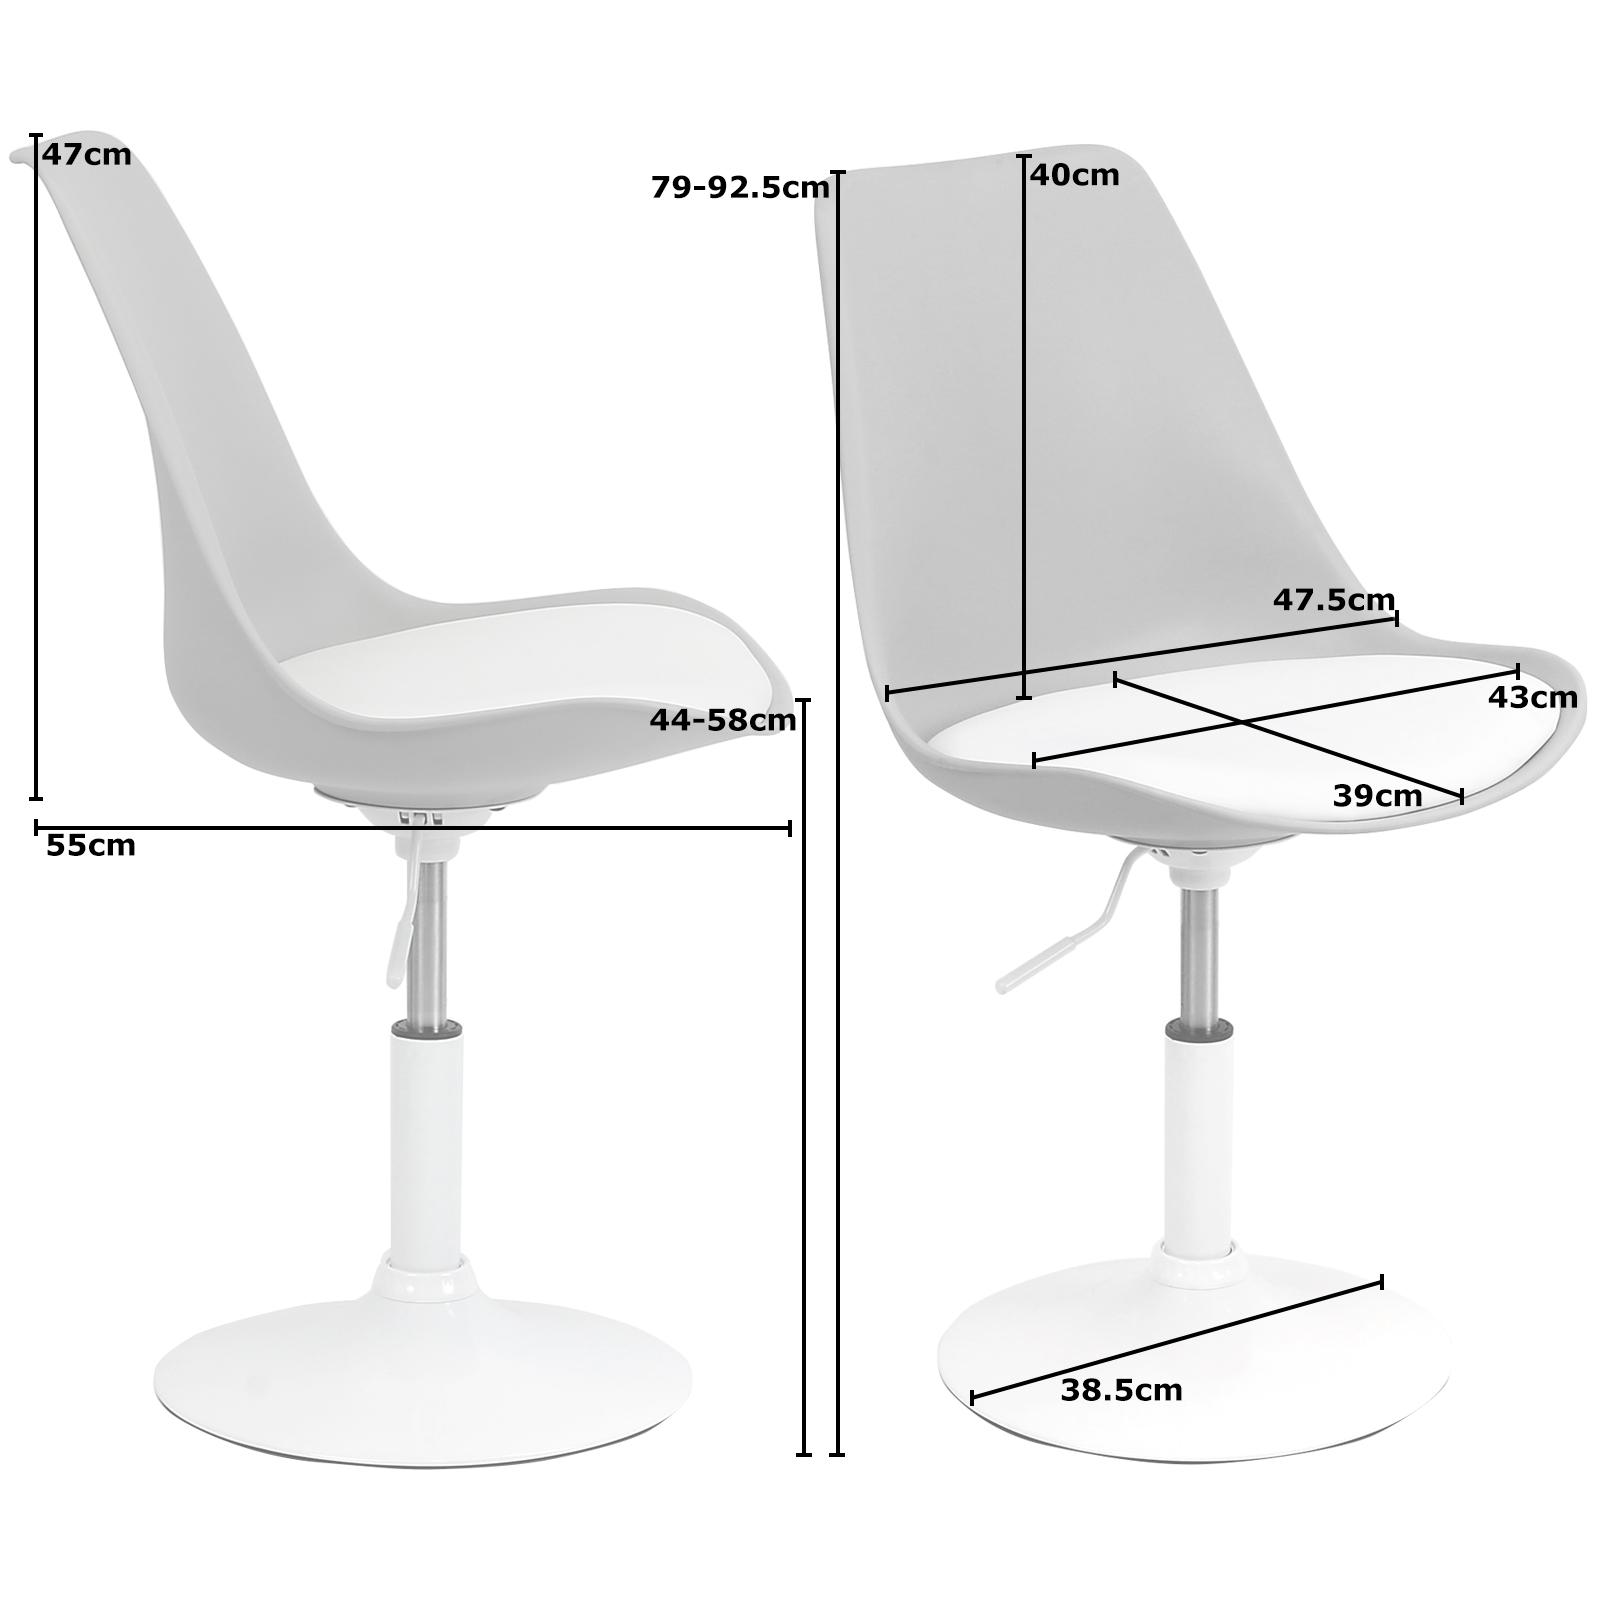 white swivel desk chair uk bedroom gumtree ferndown hartleys and grey seat tulip reception